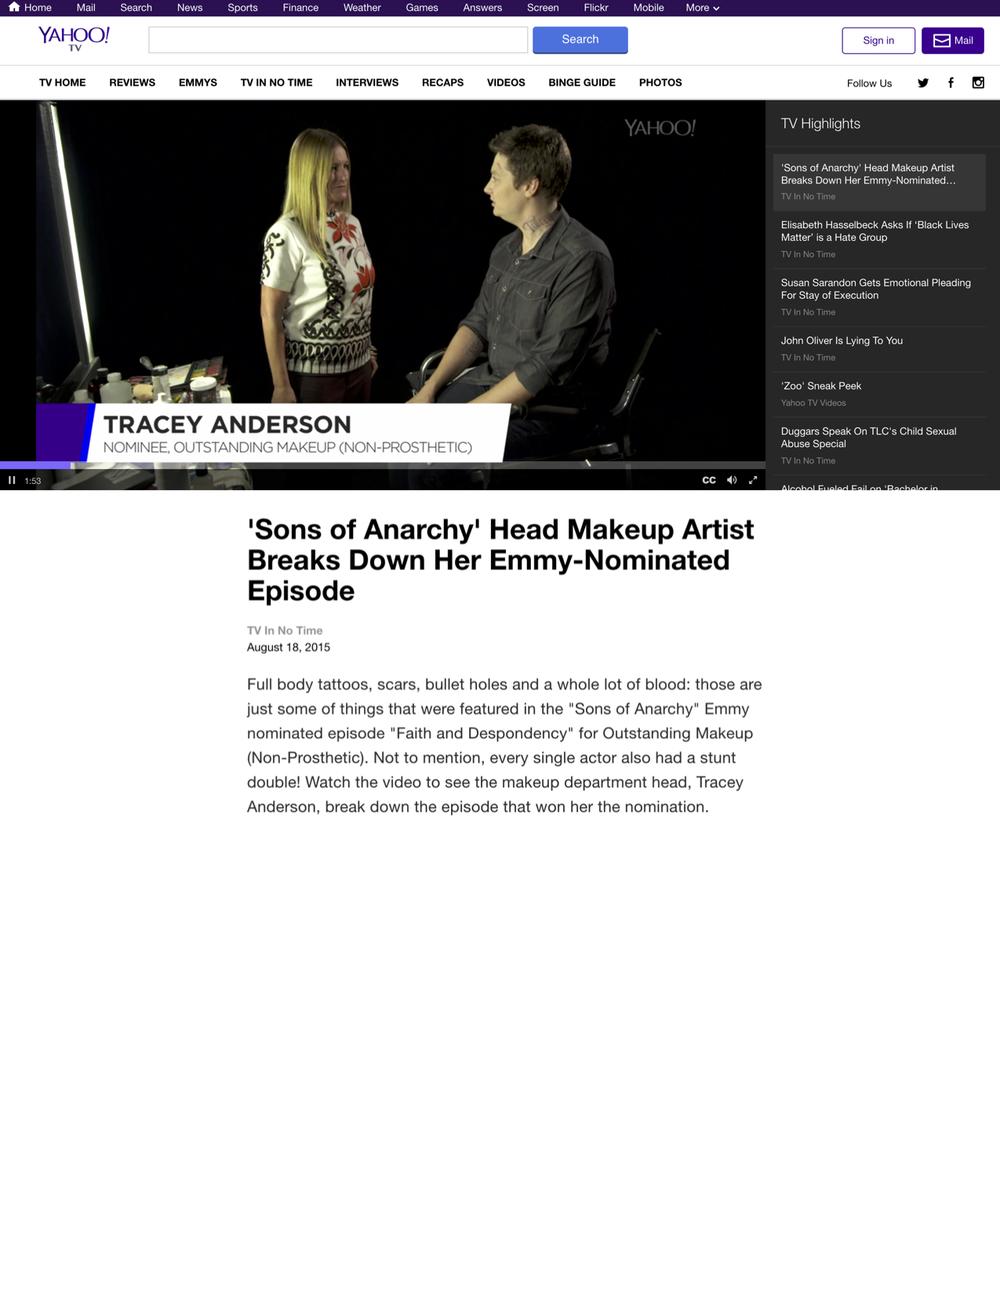 Yahoo - SOA Head Makeup Artist Breaks Down Her Emmy-Nominated Episode.jpg